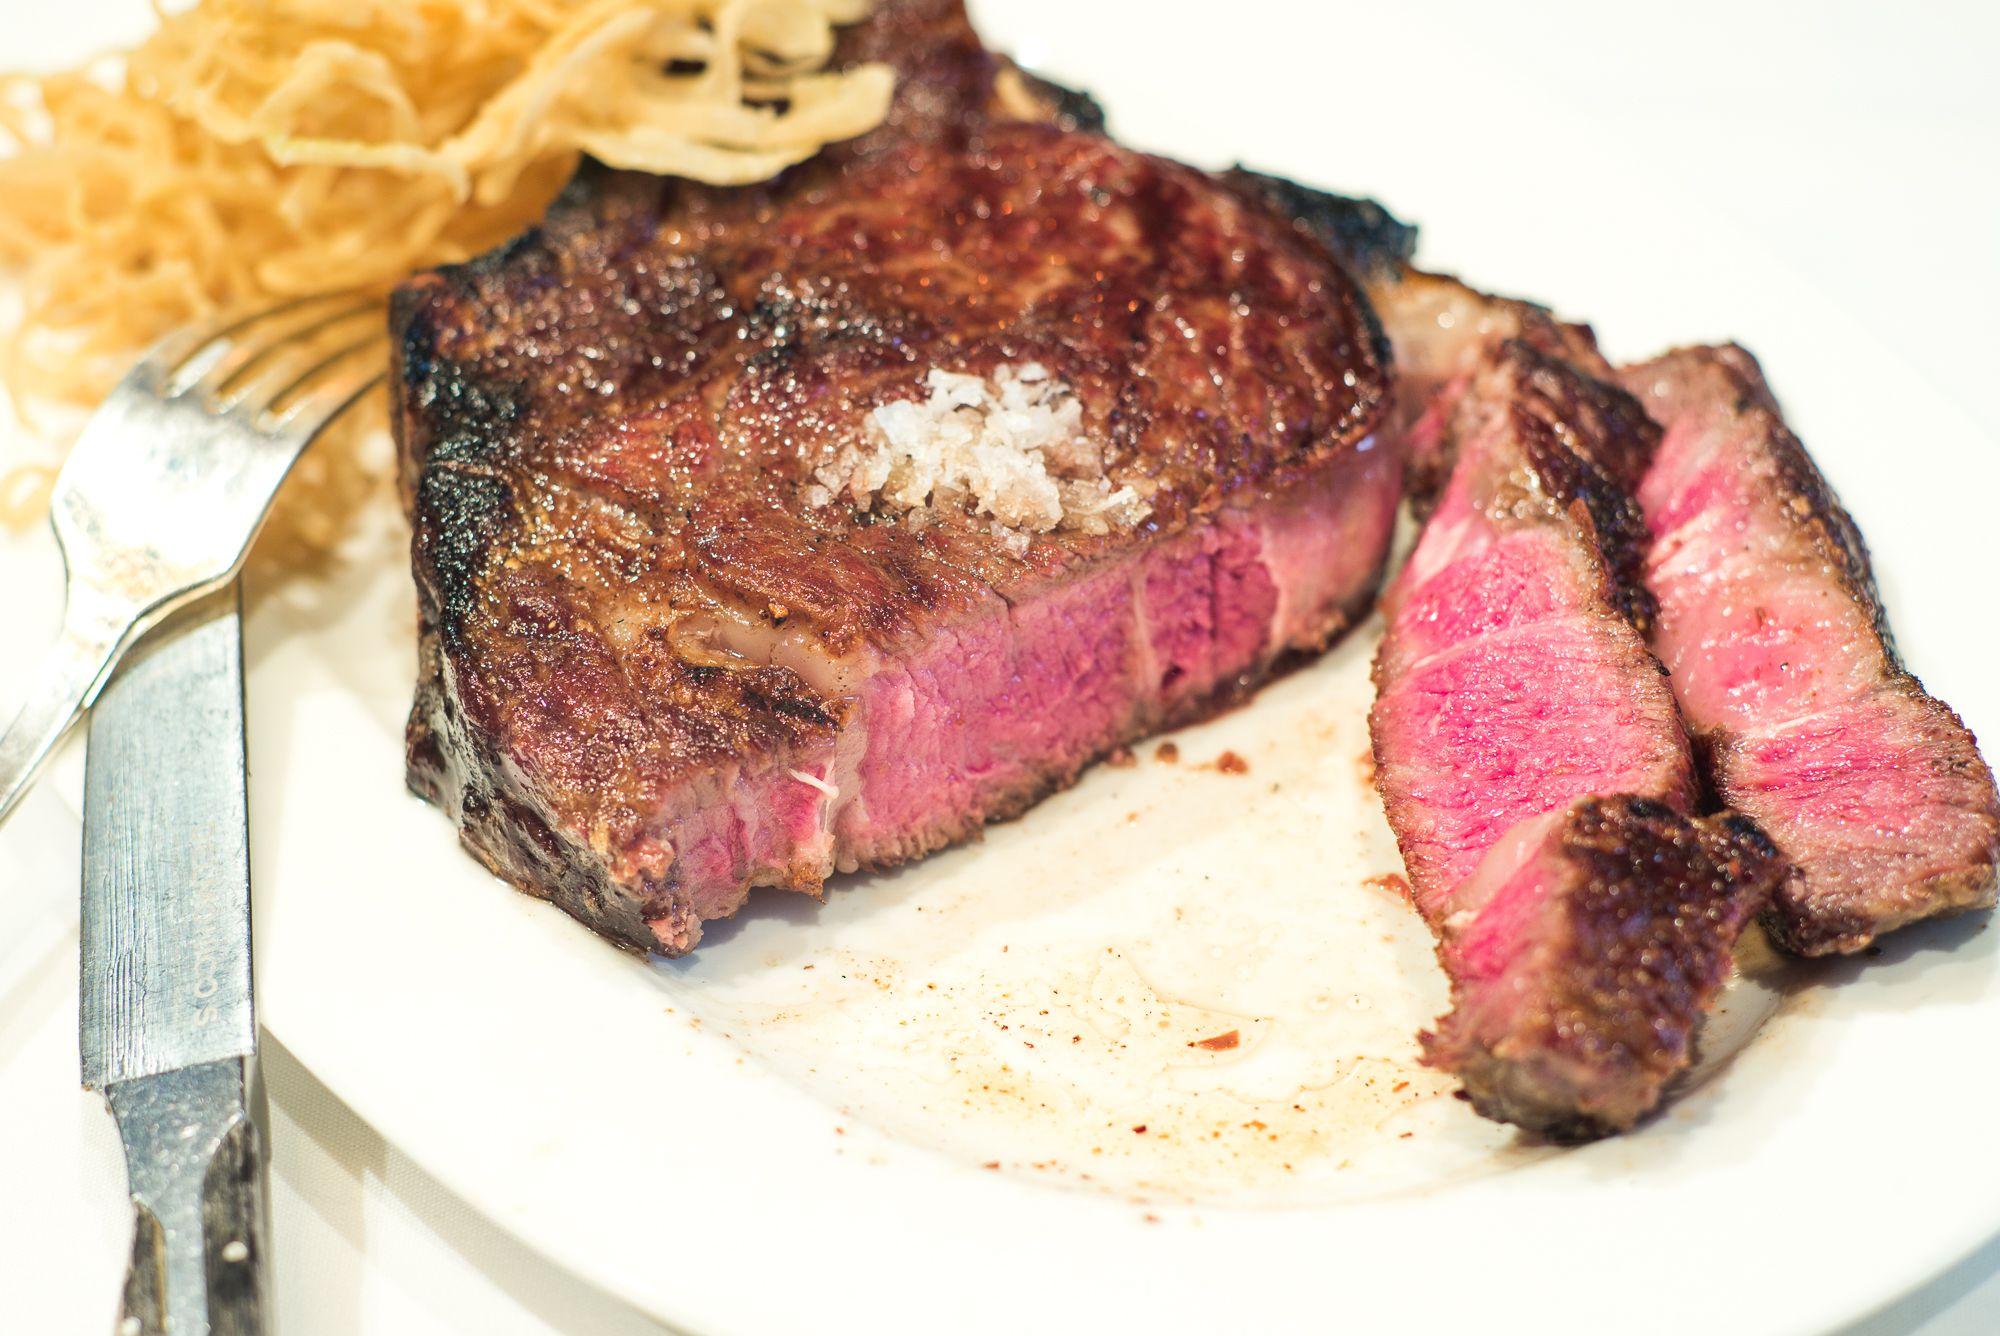 Delmonico steak]